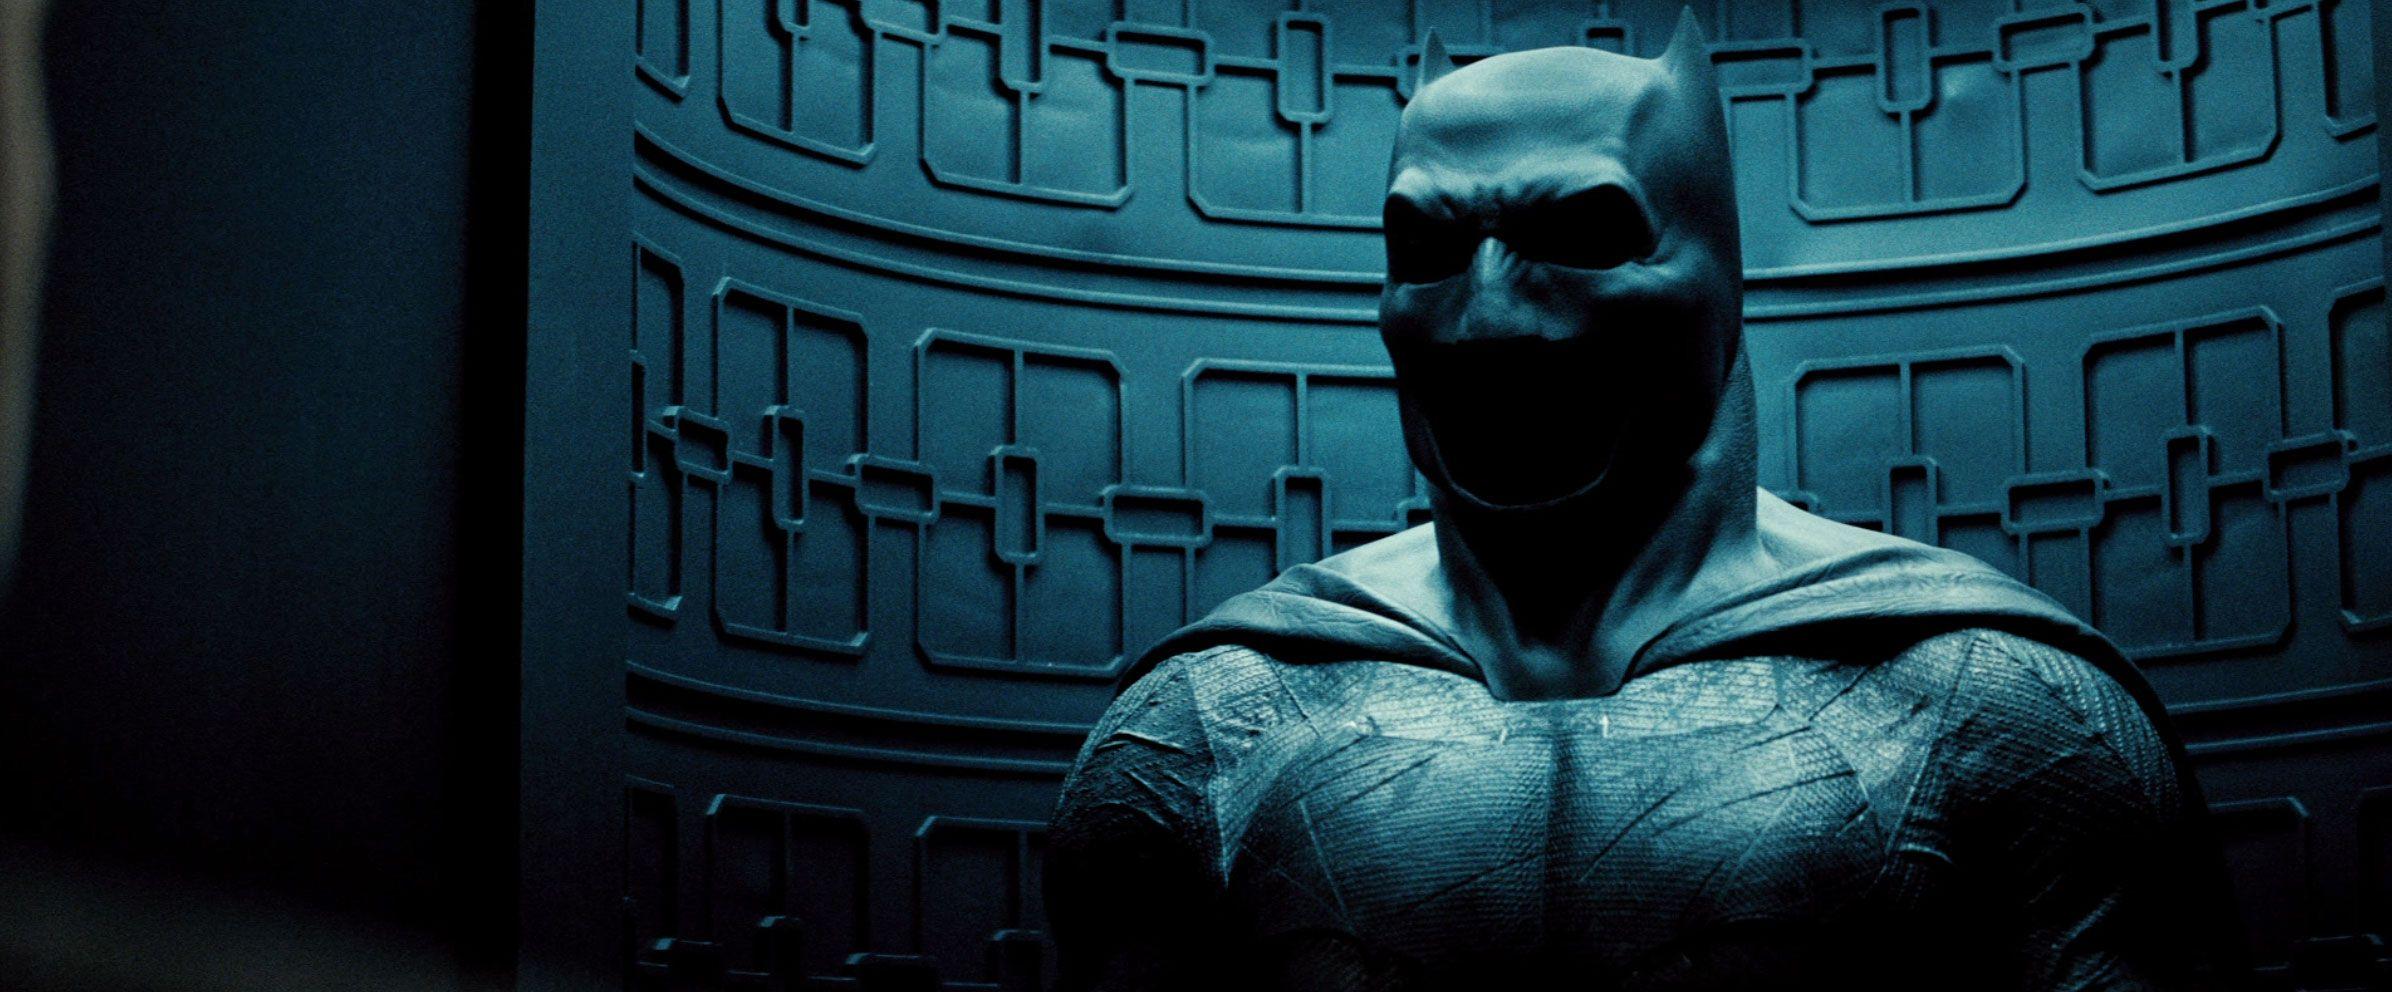 Batman V Superman Trailer Screengrab 13